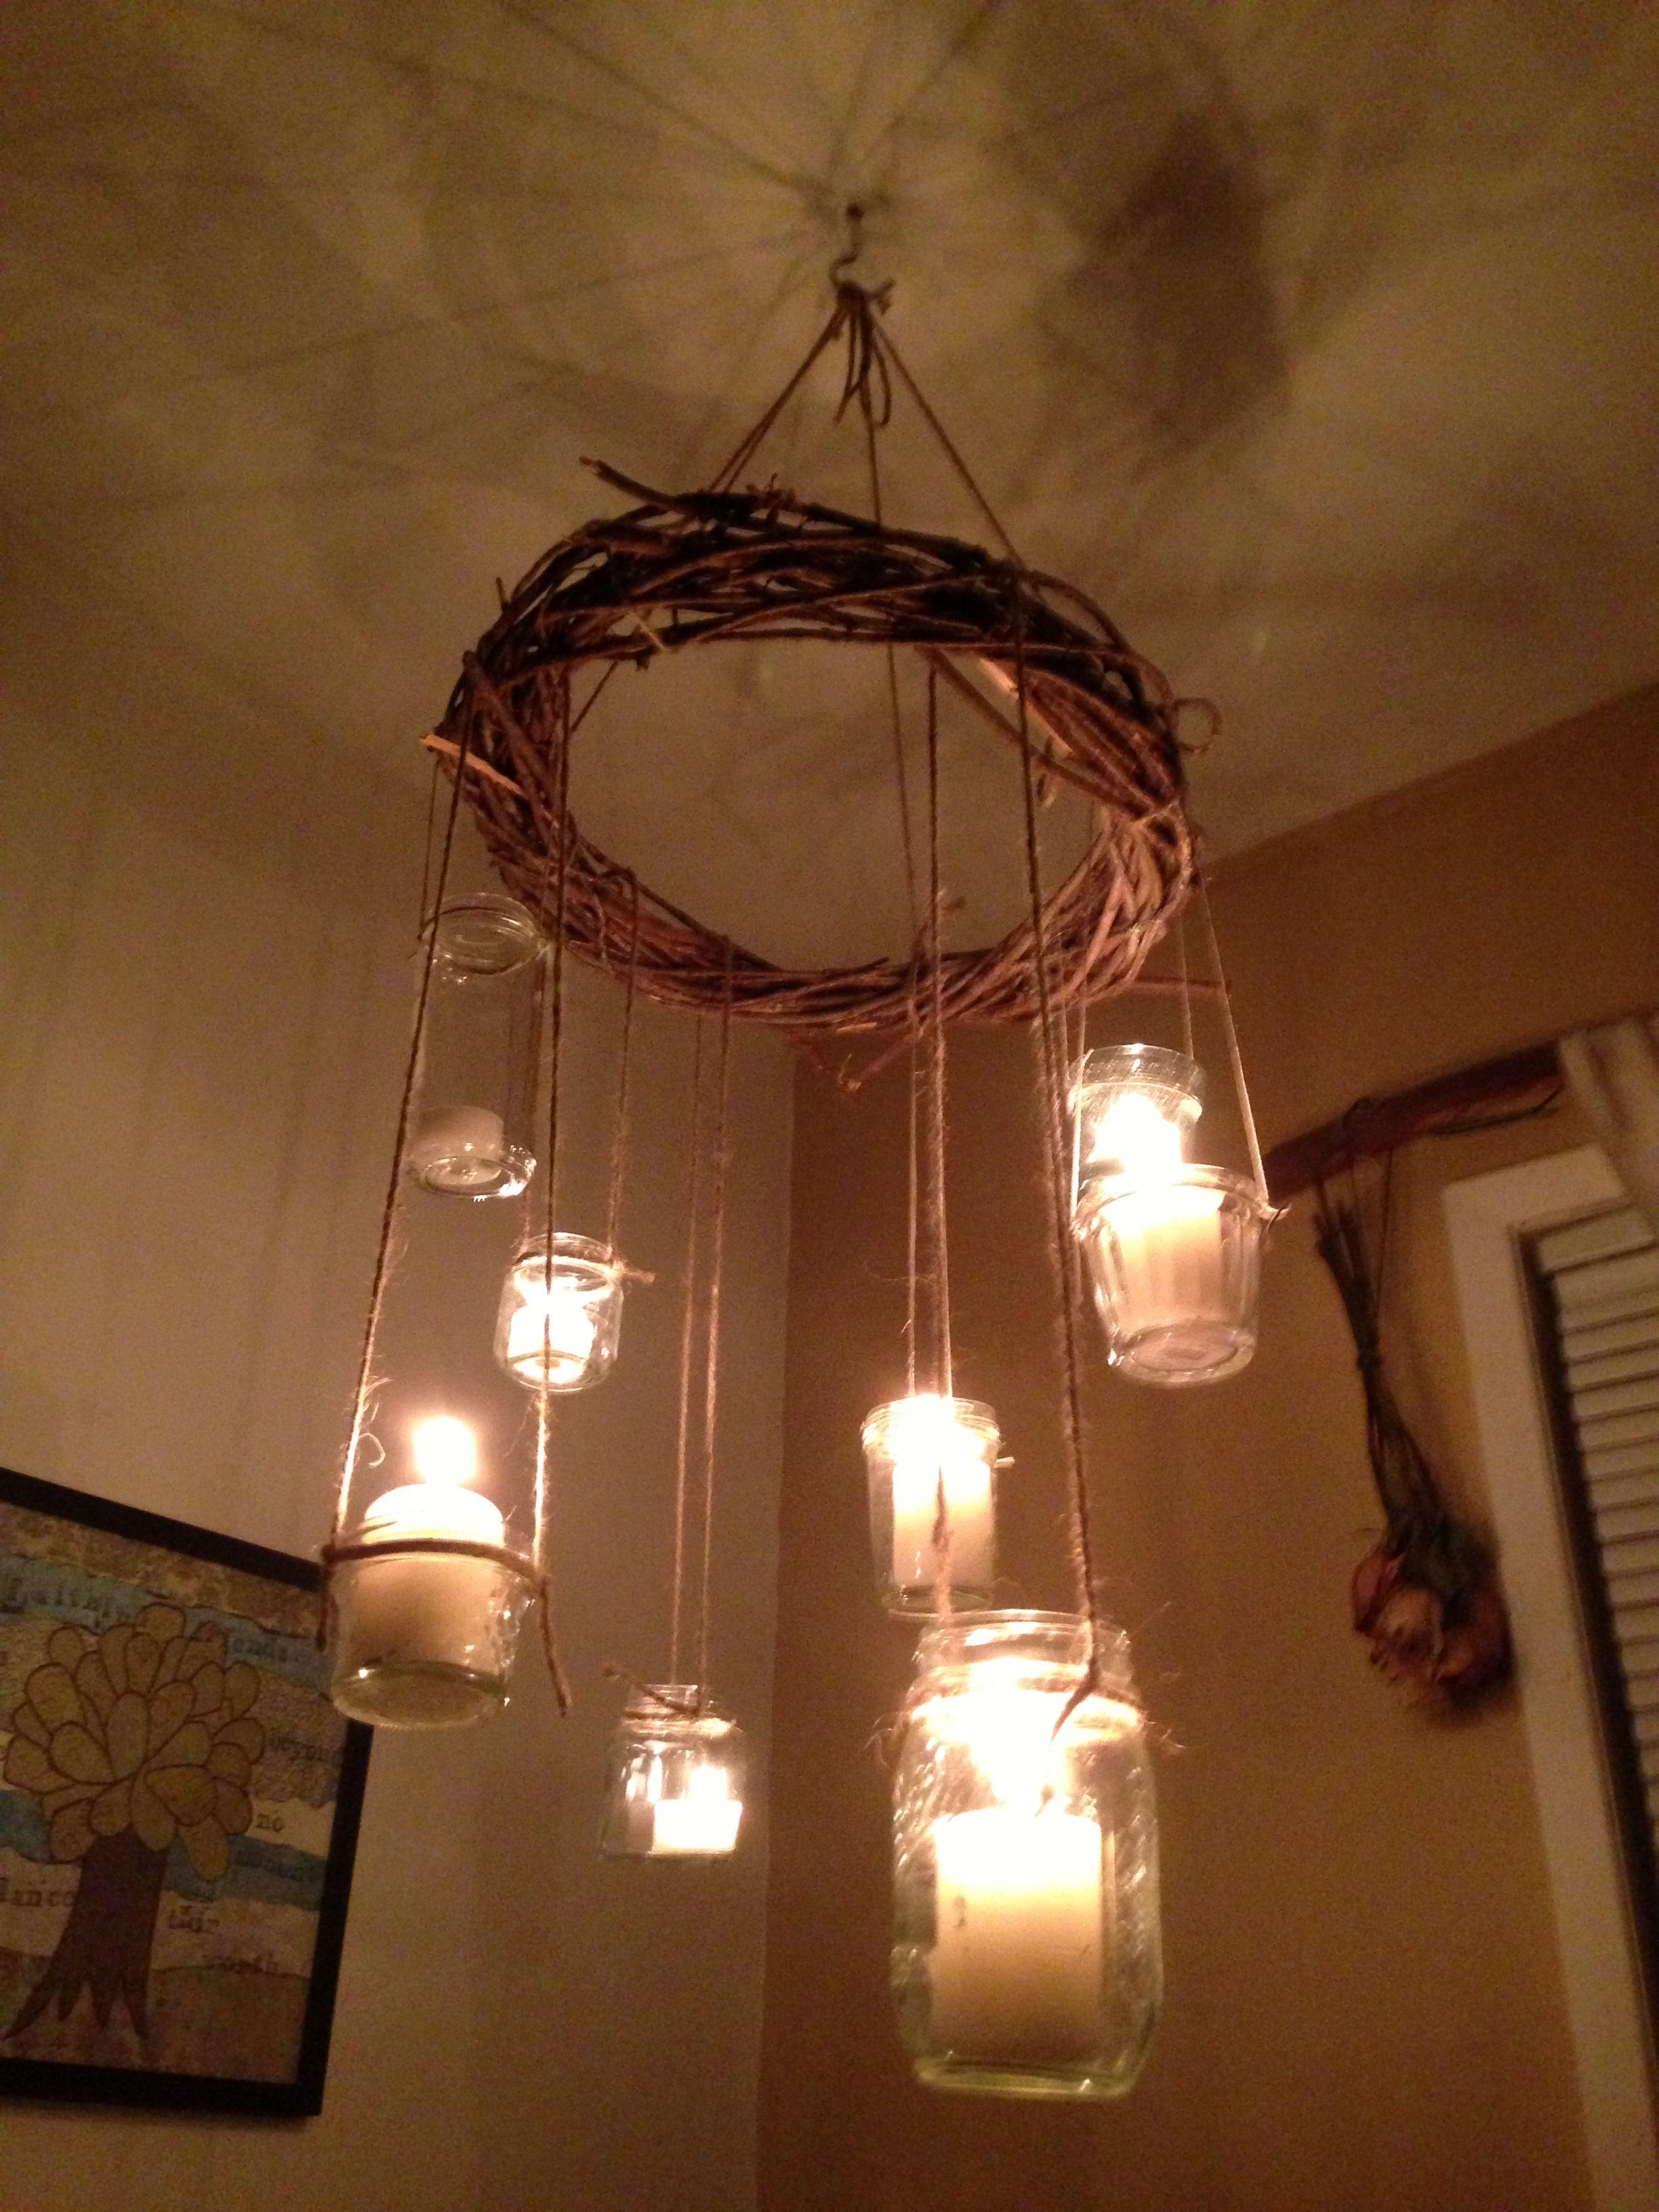 Handmade rustic chandelier | Gettin Handsy | Pinterest ...